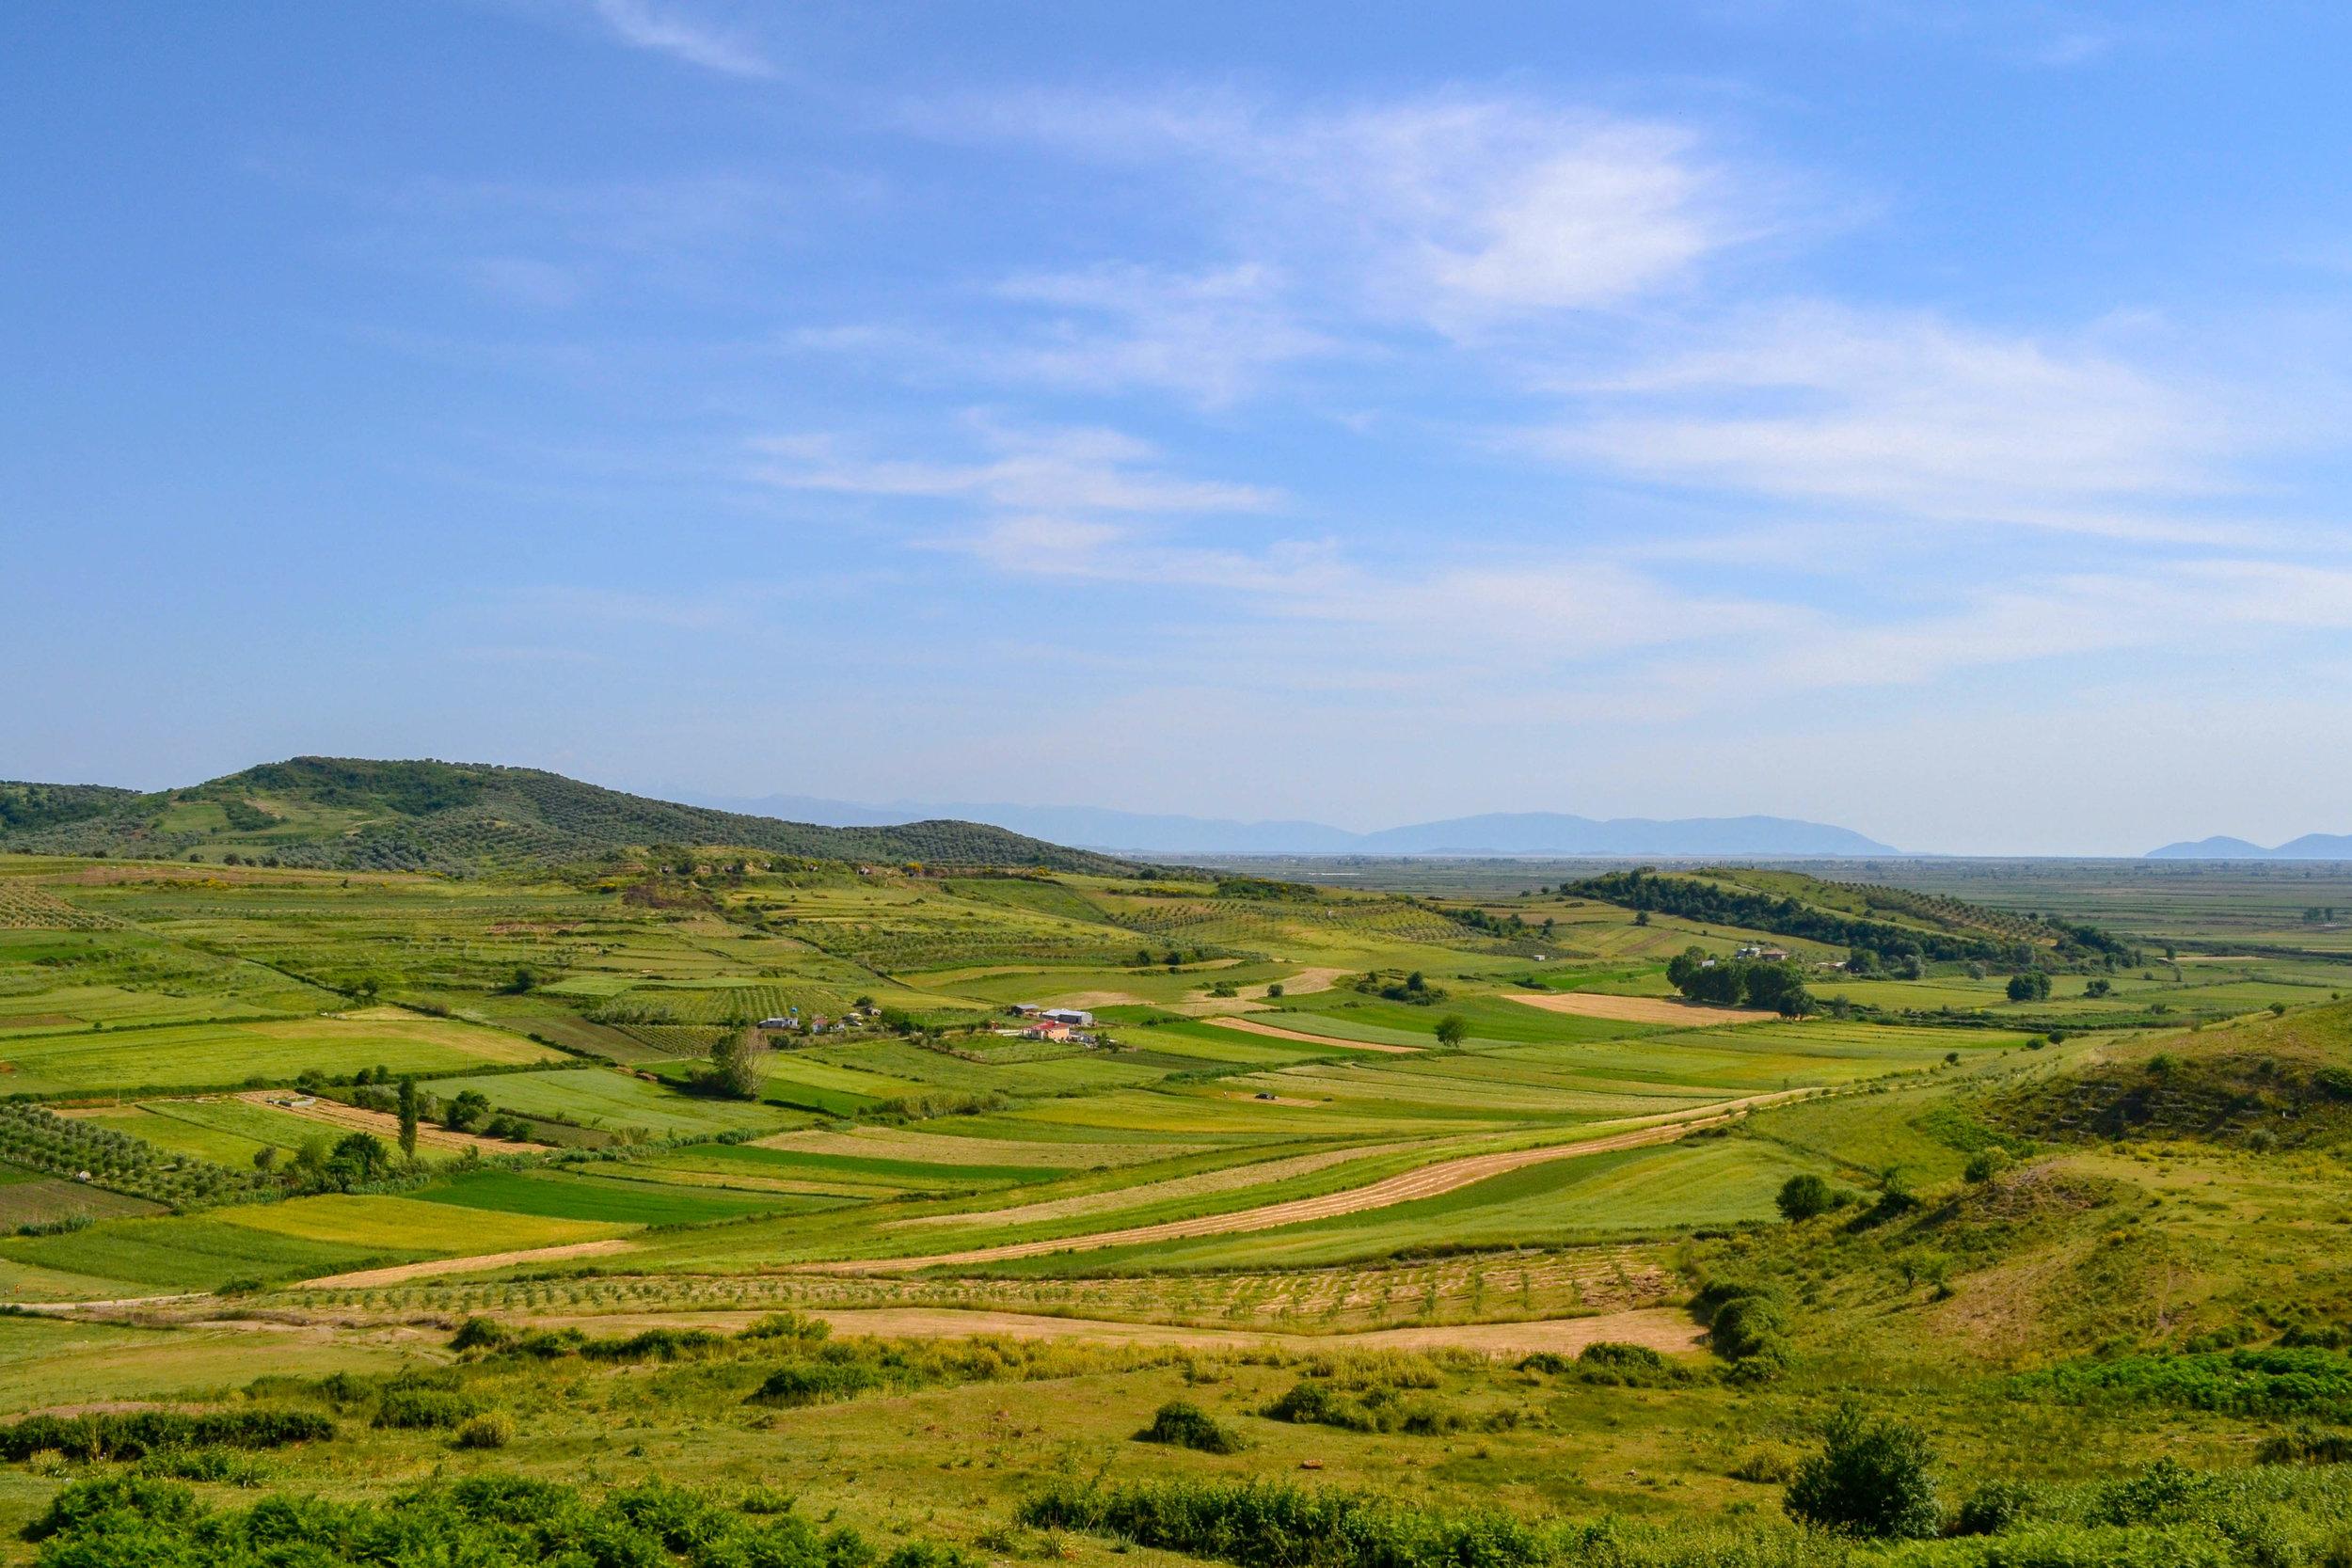 Rural Albanian landscape